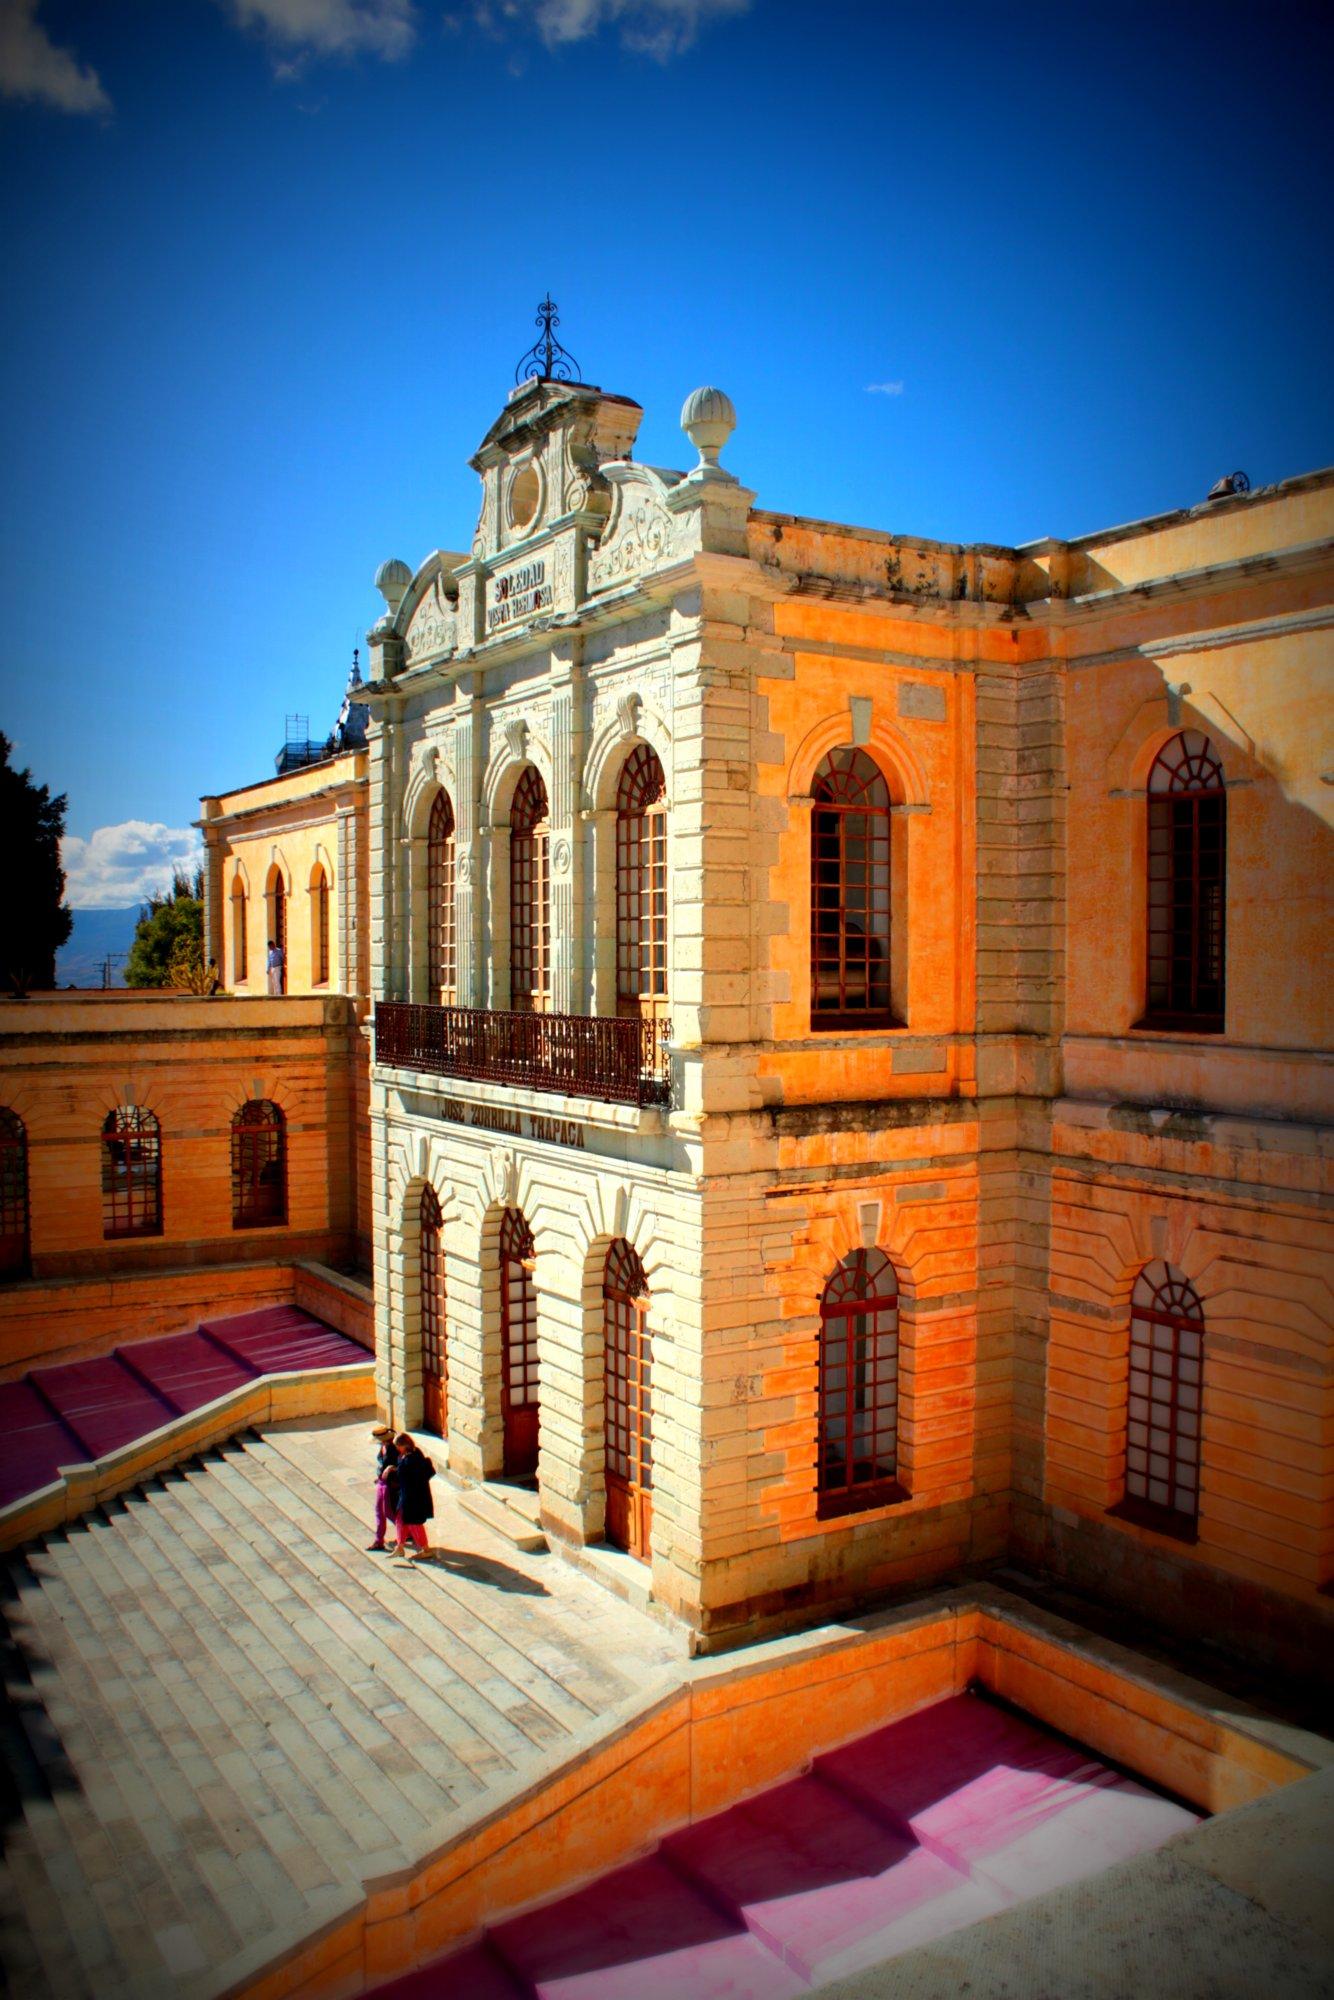 CASA - Center for the Arts in San Agustin